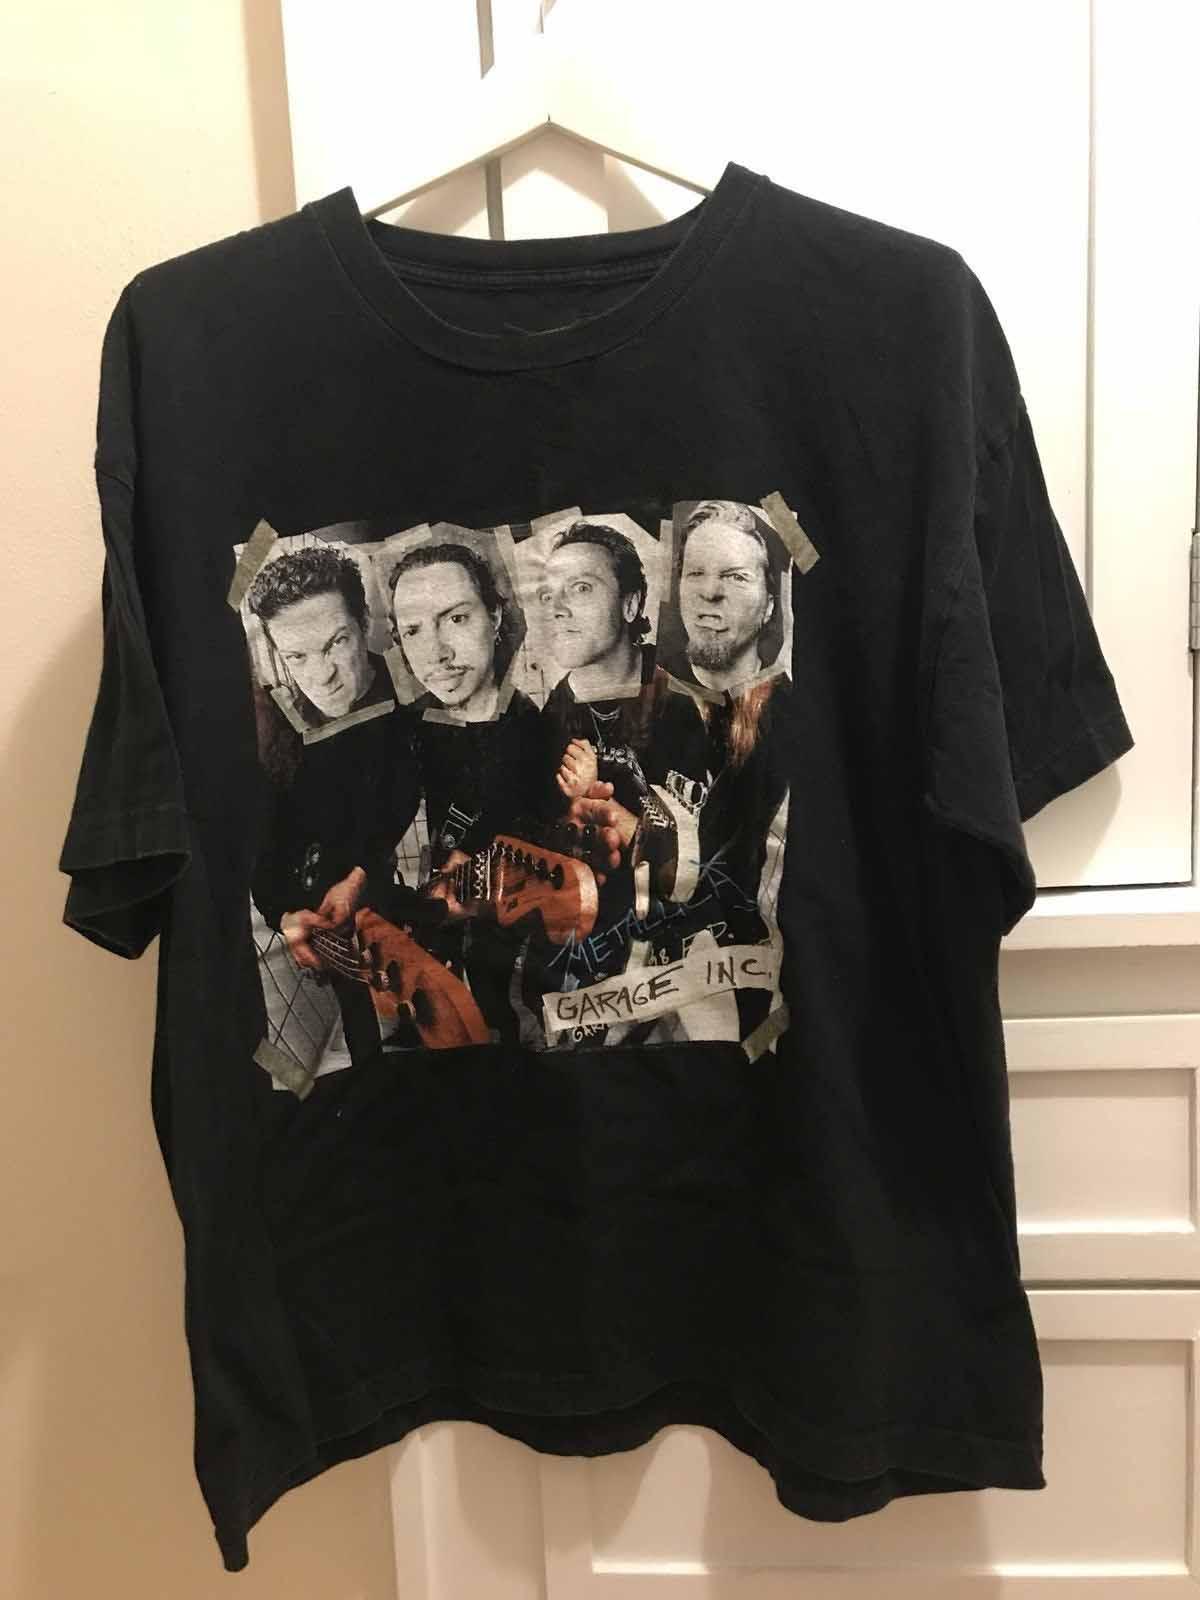 80fa8f89 Vintage Metallica Garage Inc 1998 T Shirt Mens Size XL GIANT Tag Summer  2018 shirt Short Sleeve Plus Size